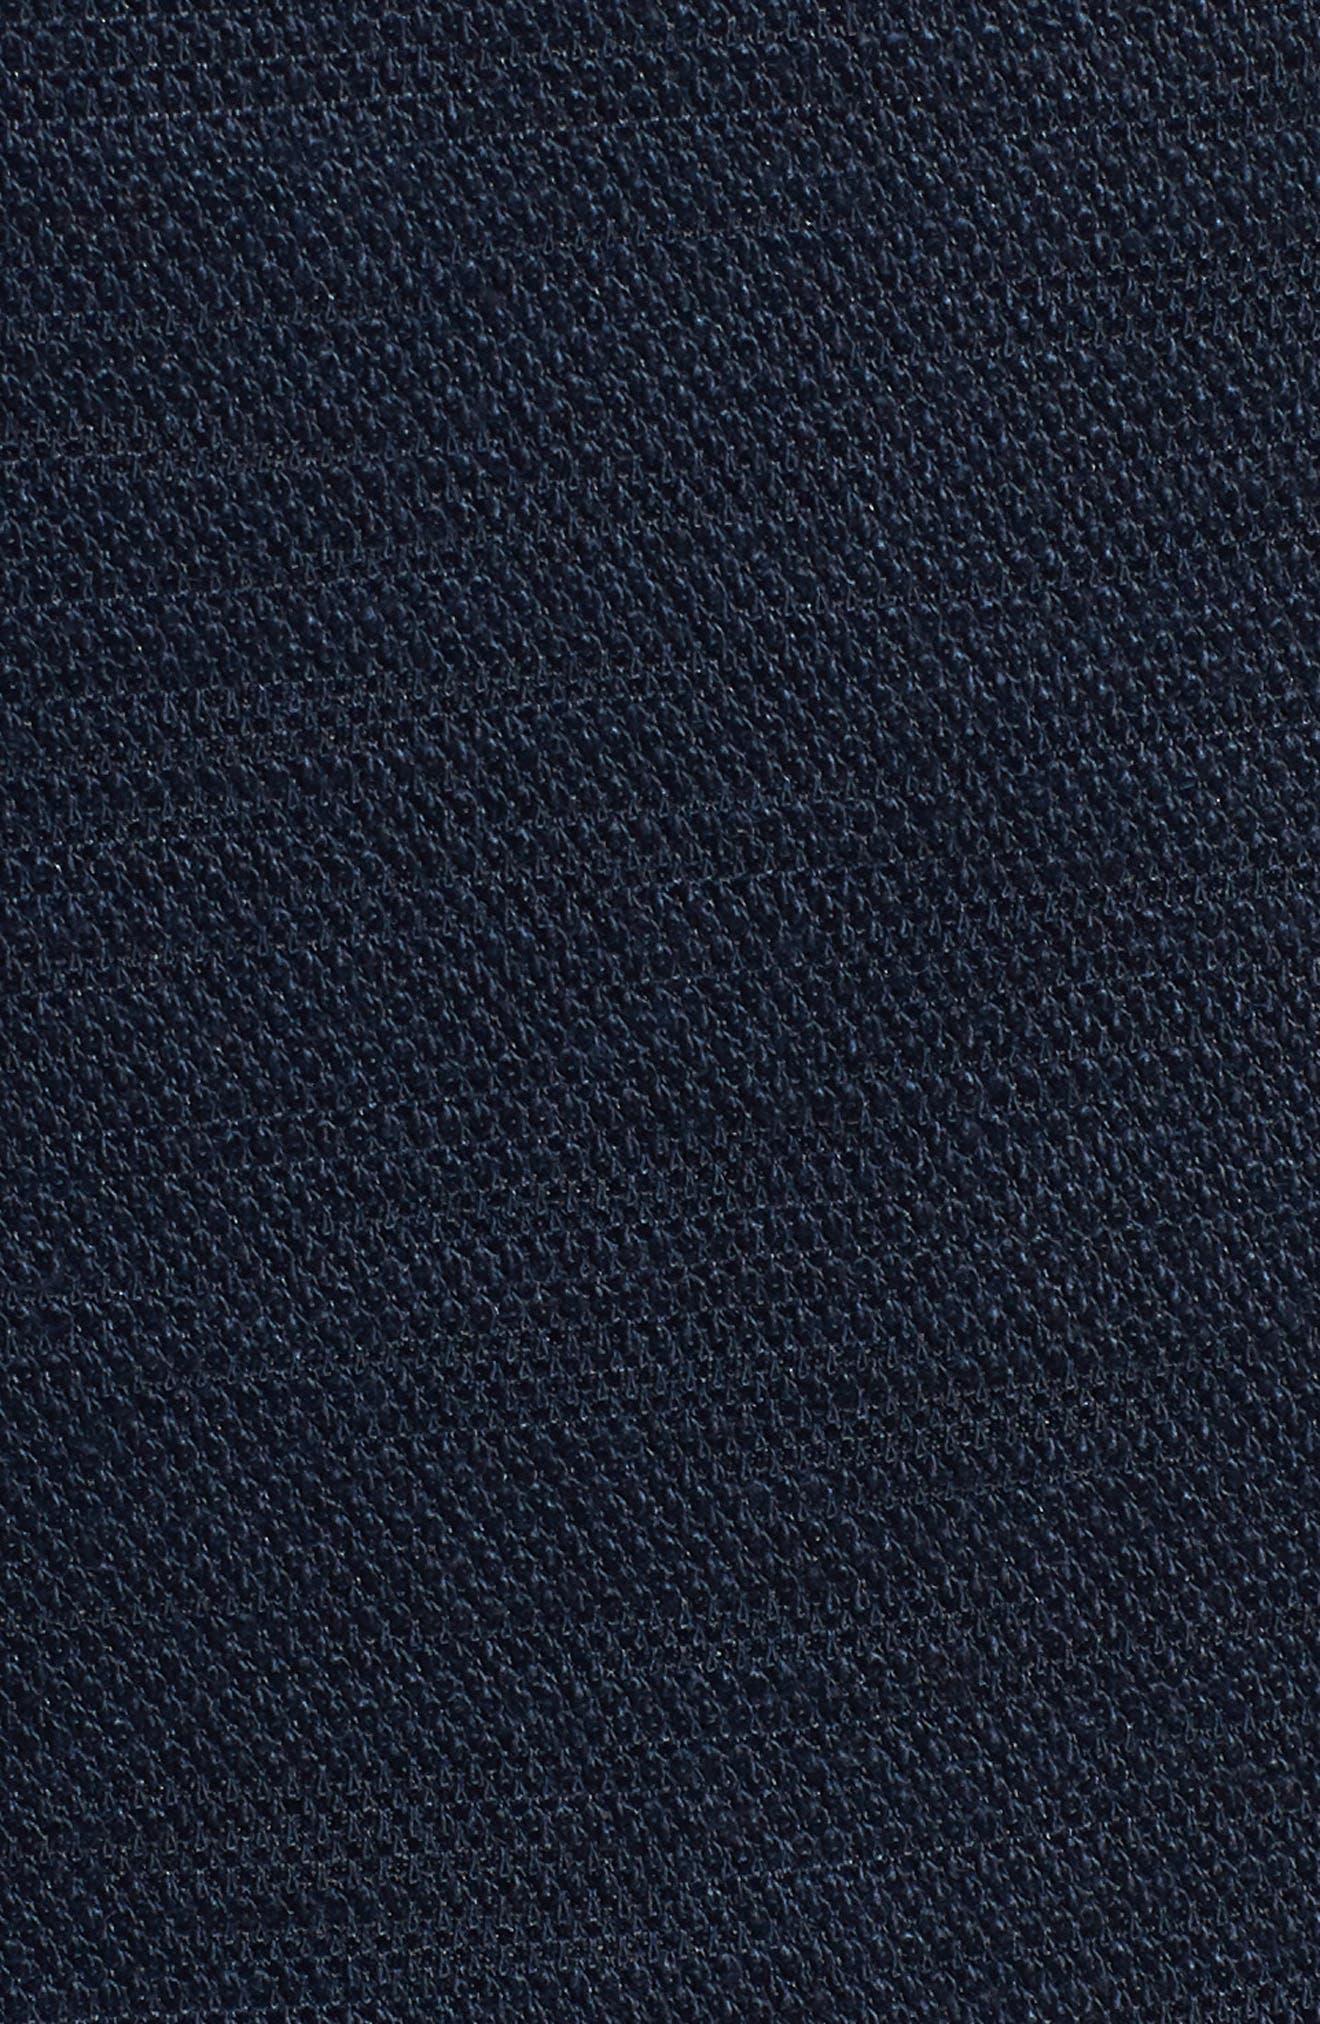 Fender Trim Fit Knit Blazer,                             Alternate thumbnail 5, color,                             Navy